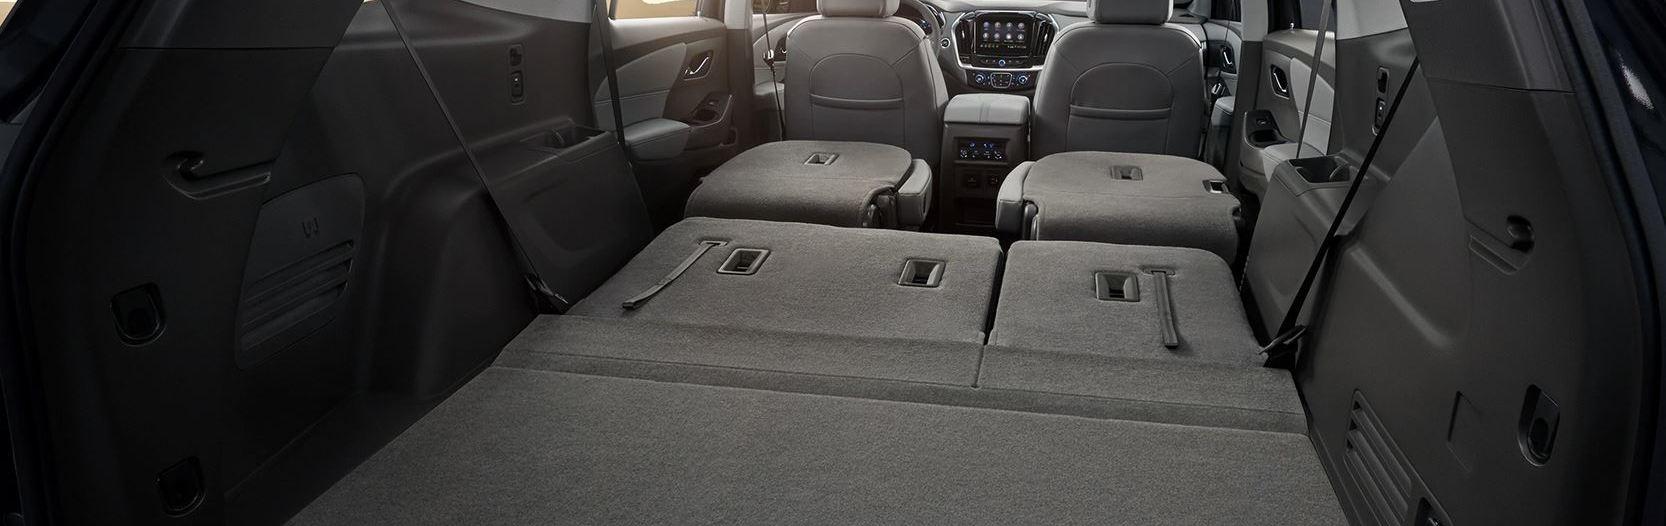 2020 Chevrolet Traverse Cargo Area